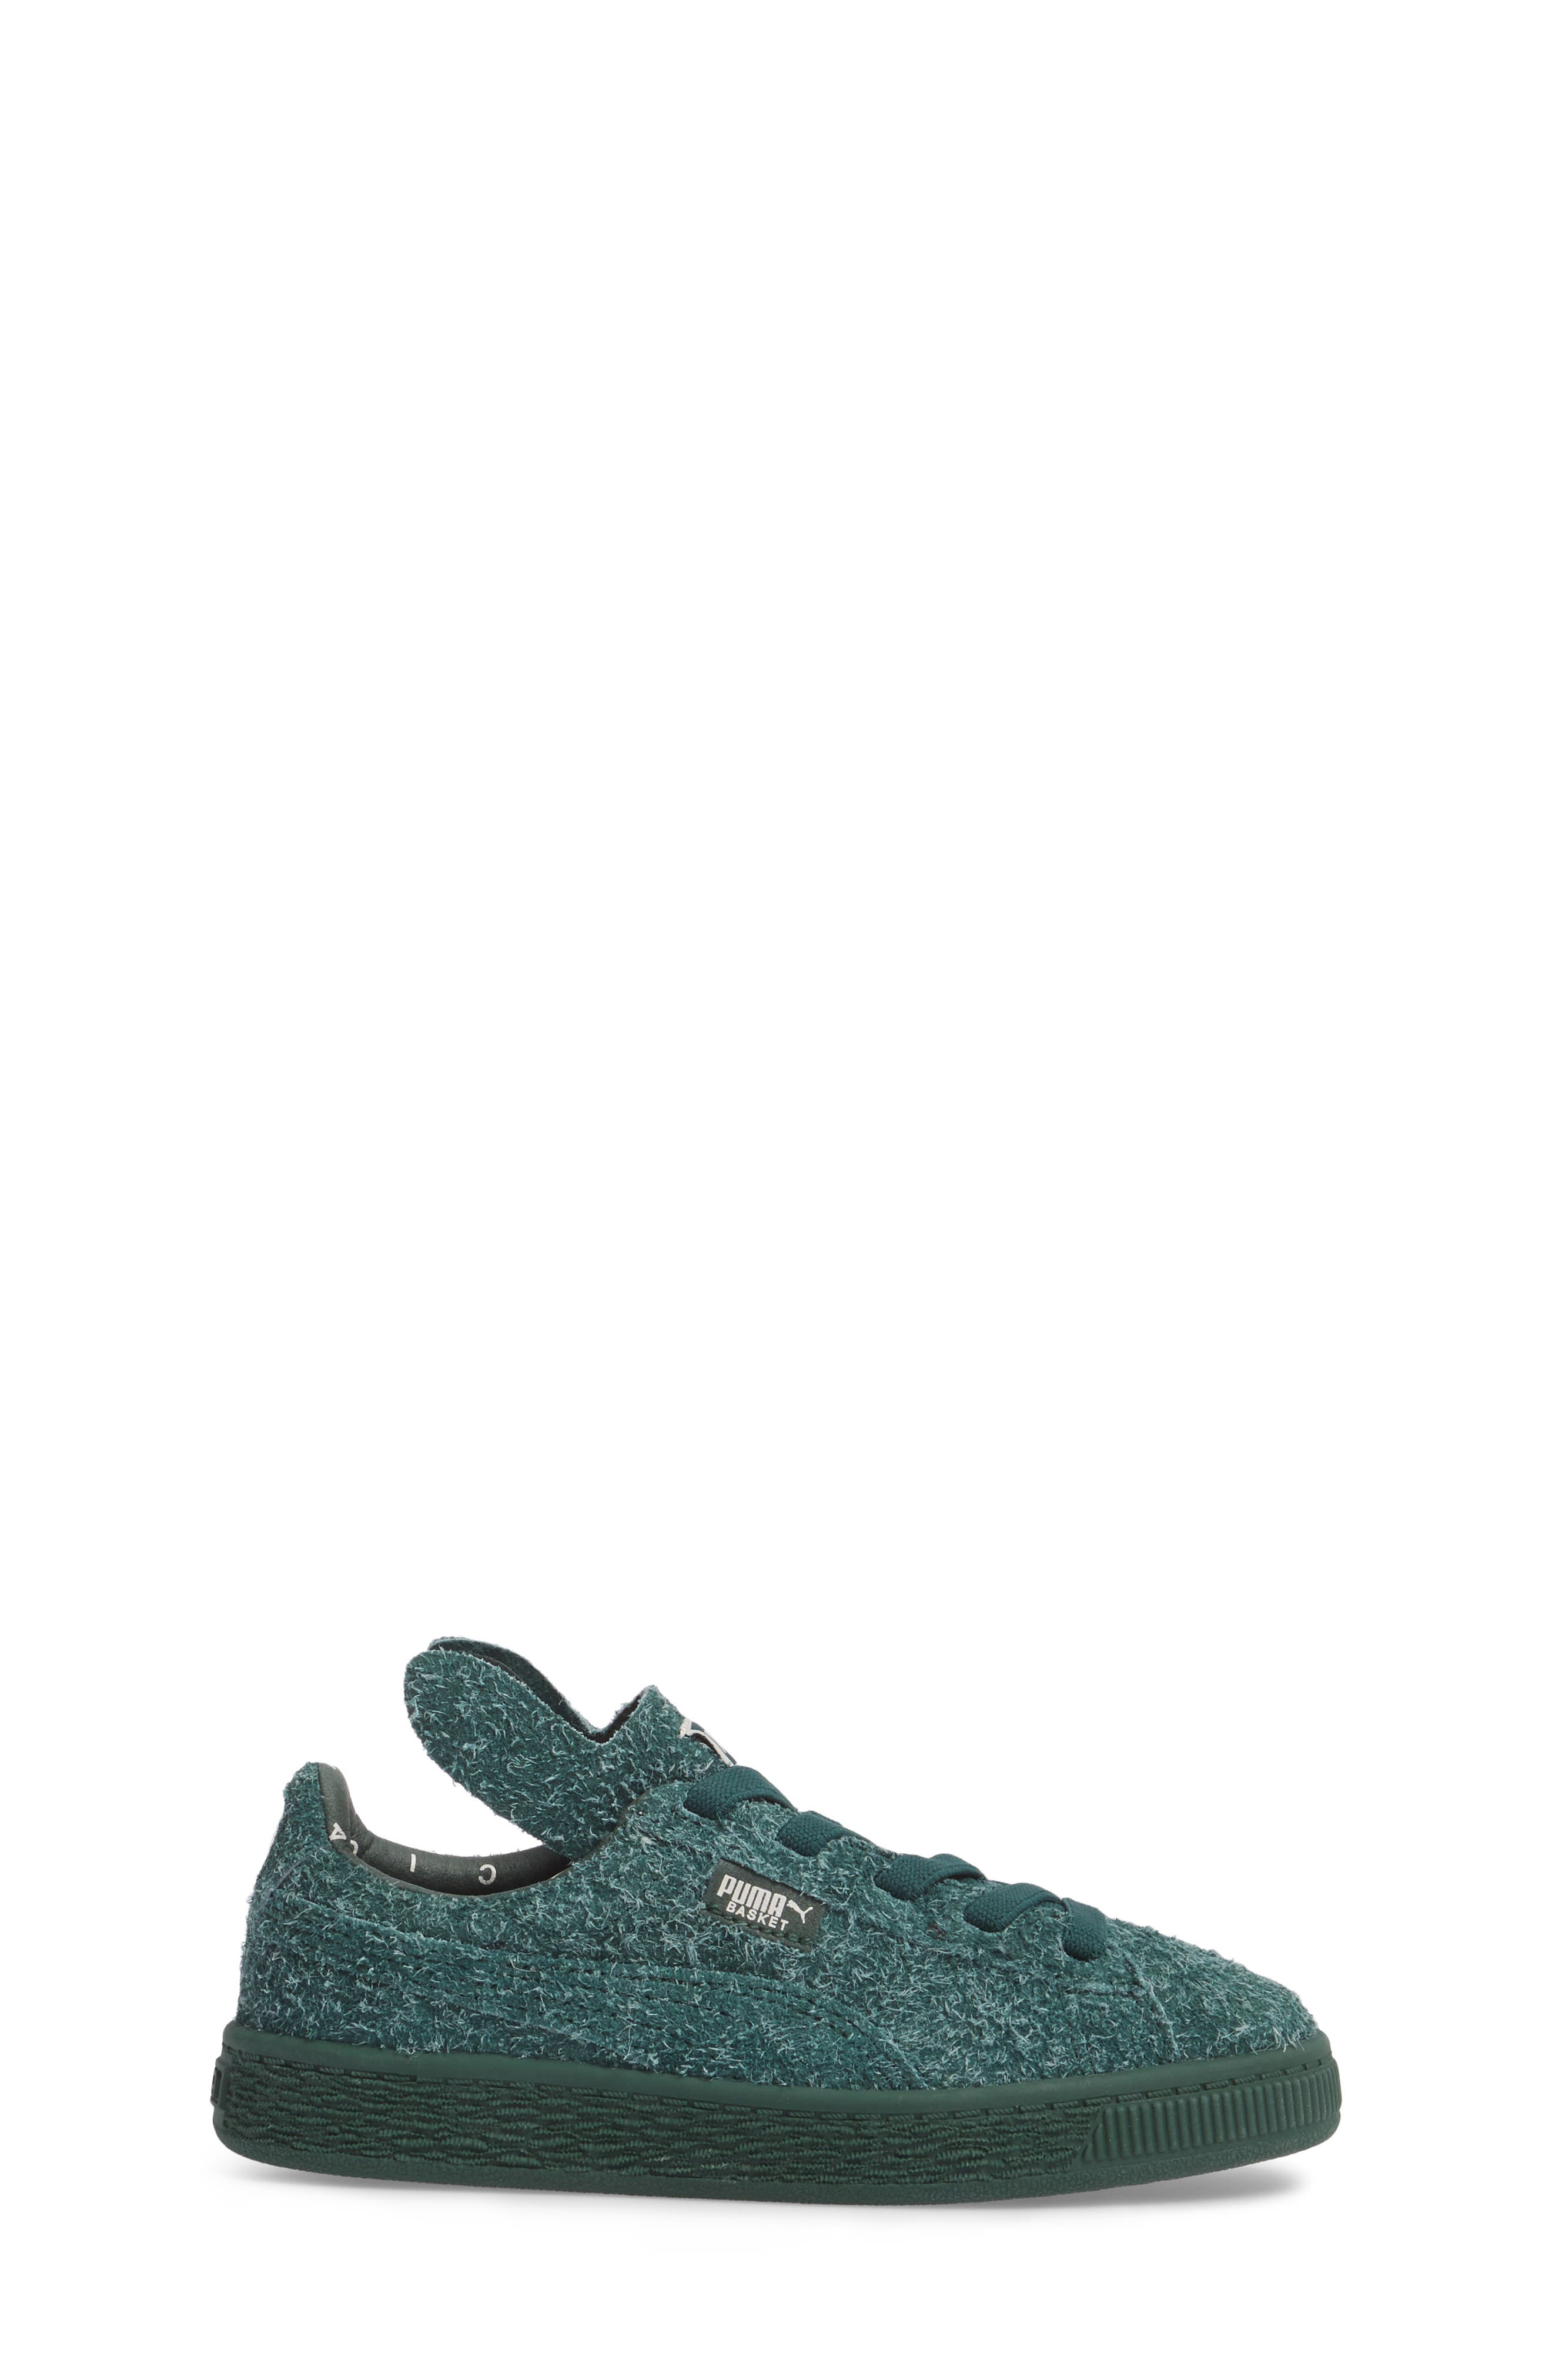 x tinycottons Basket Furry Sneaker,                             Alternate thumbnail 3, color,                             300